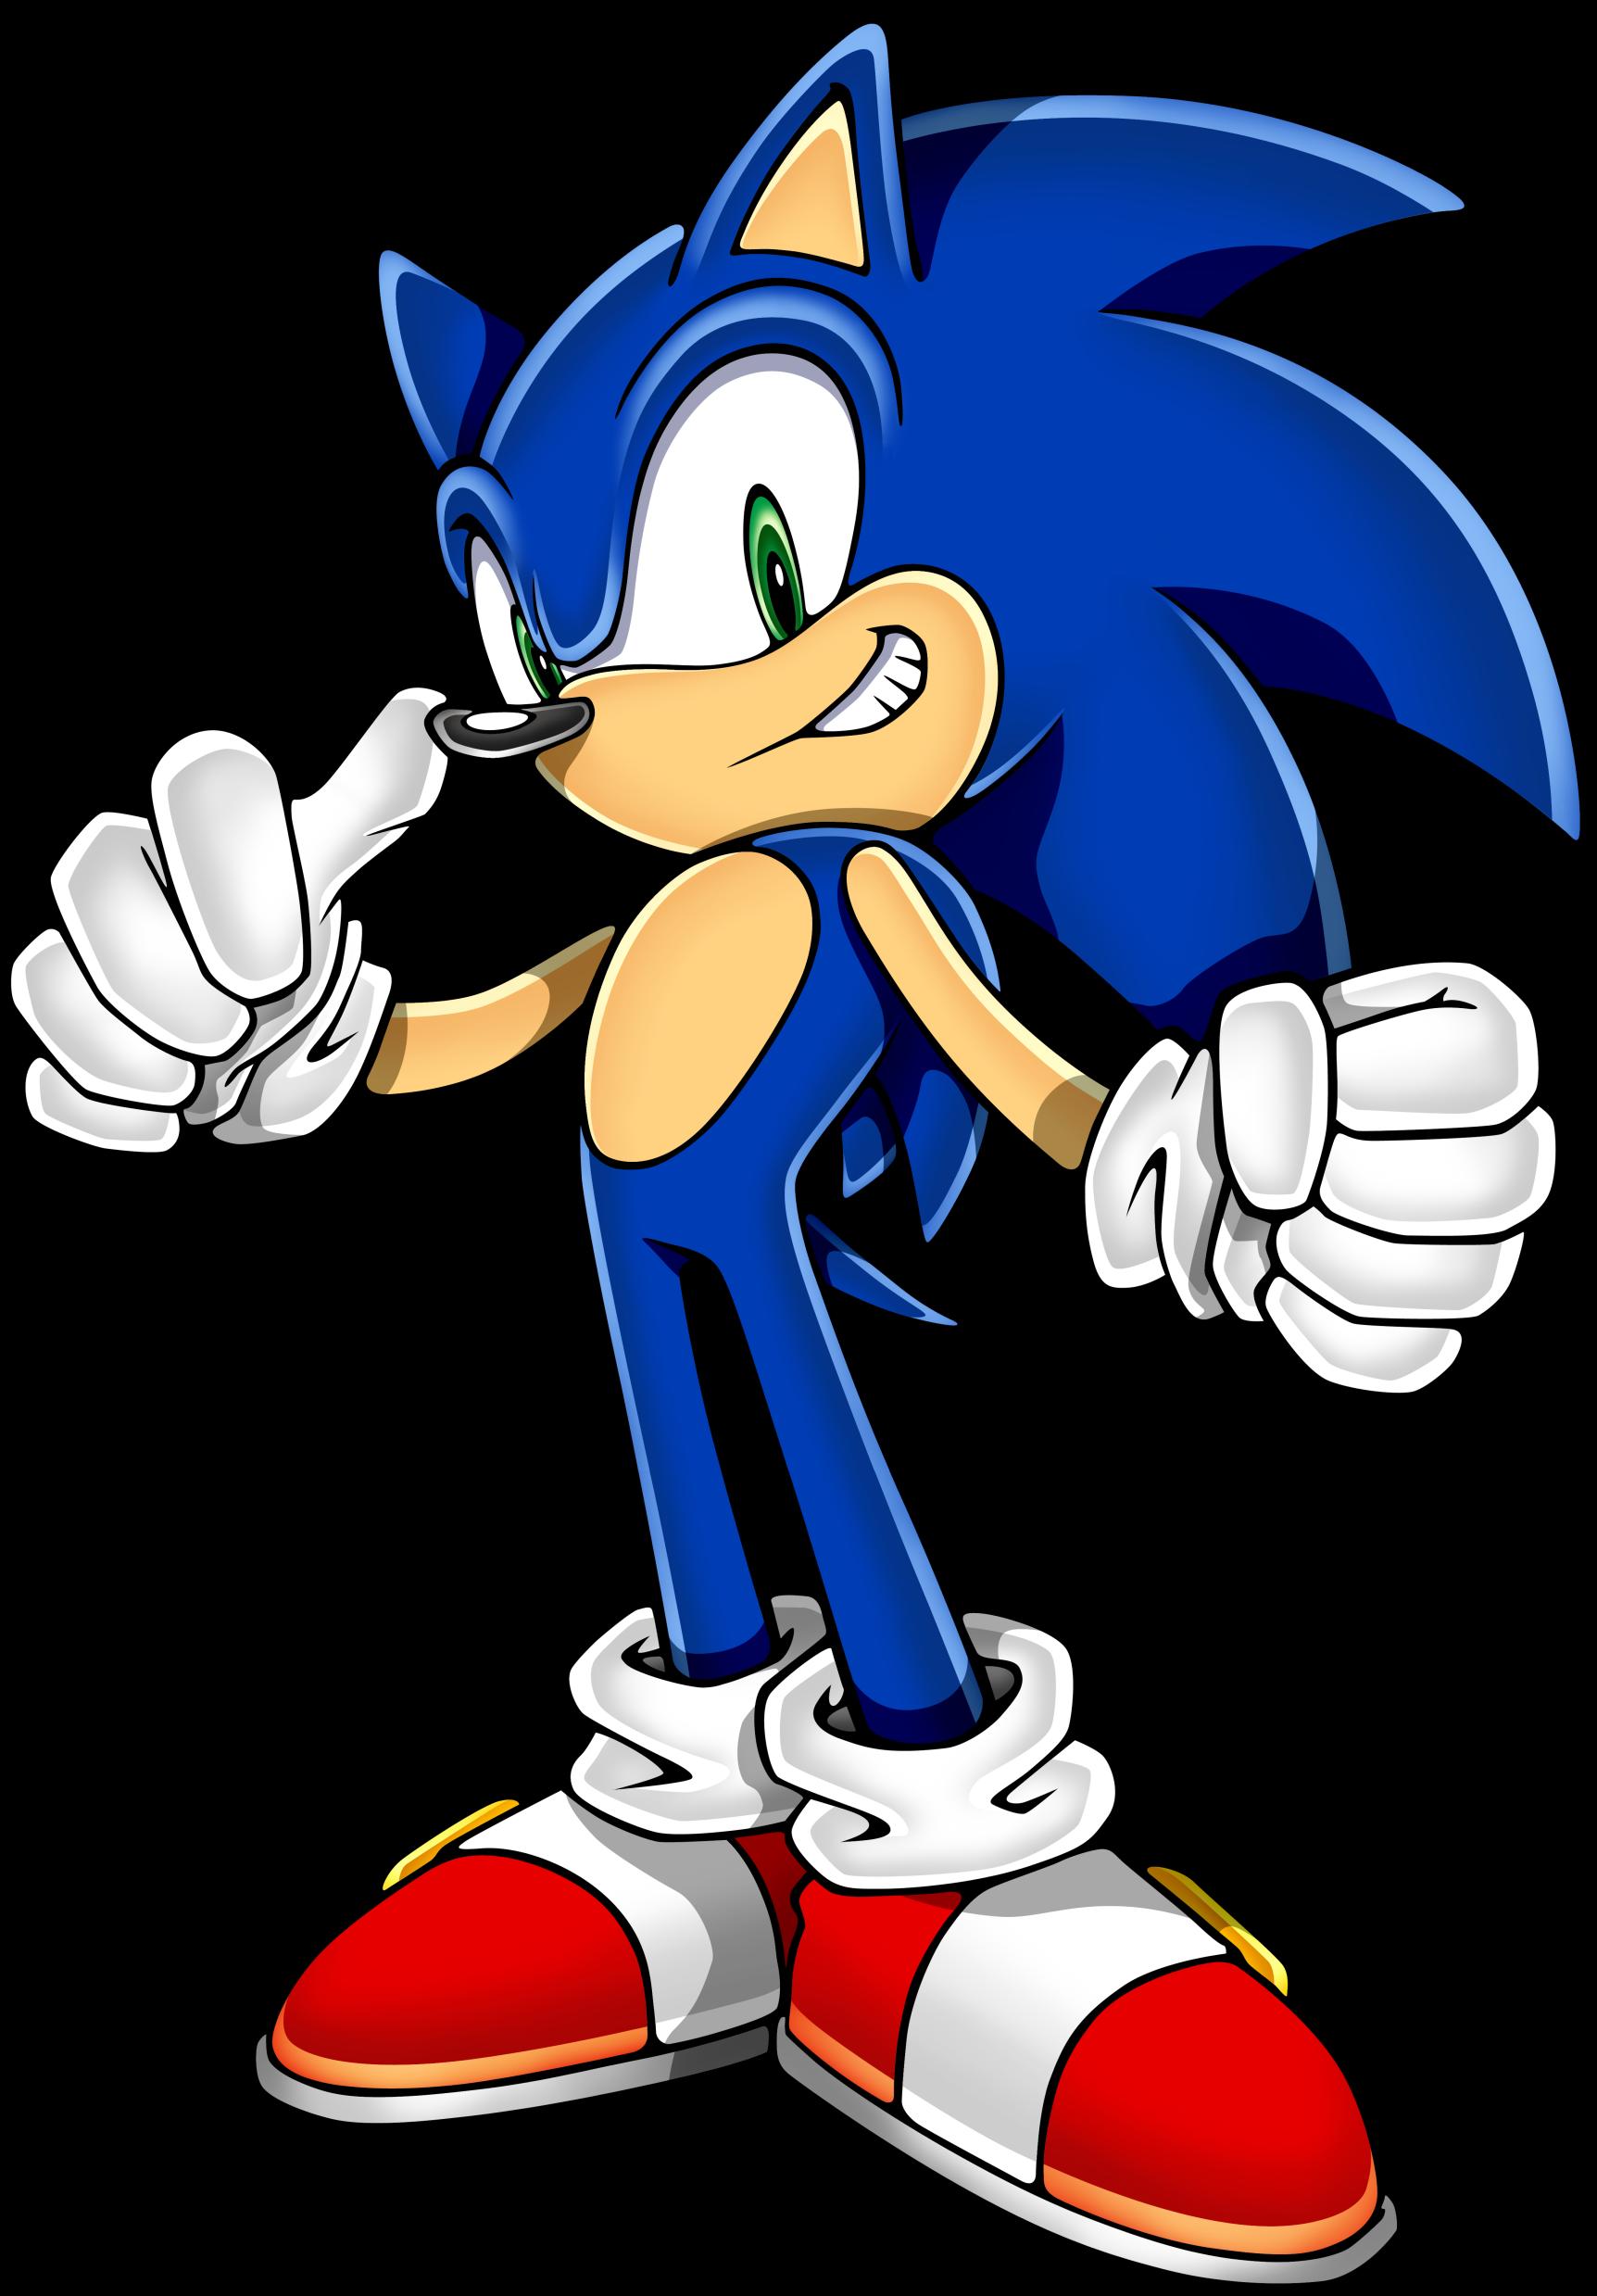 Sonic The Hedgehog Shipping Wiki Fandom